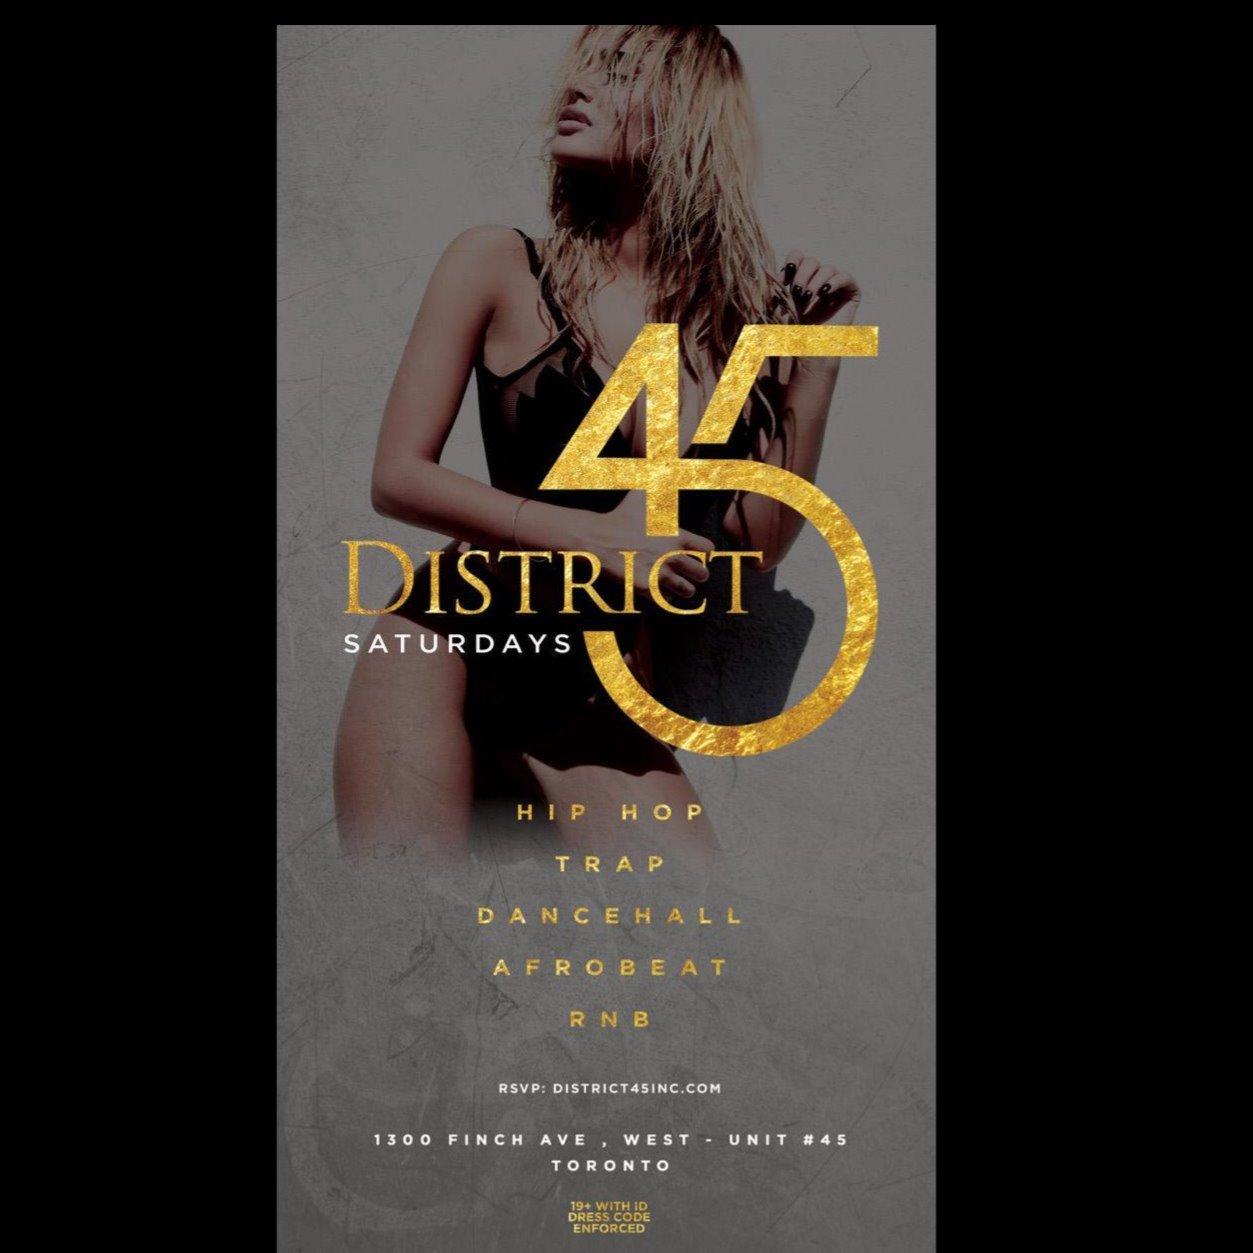 District Saturdays